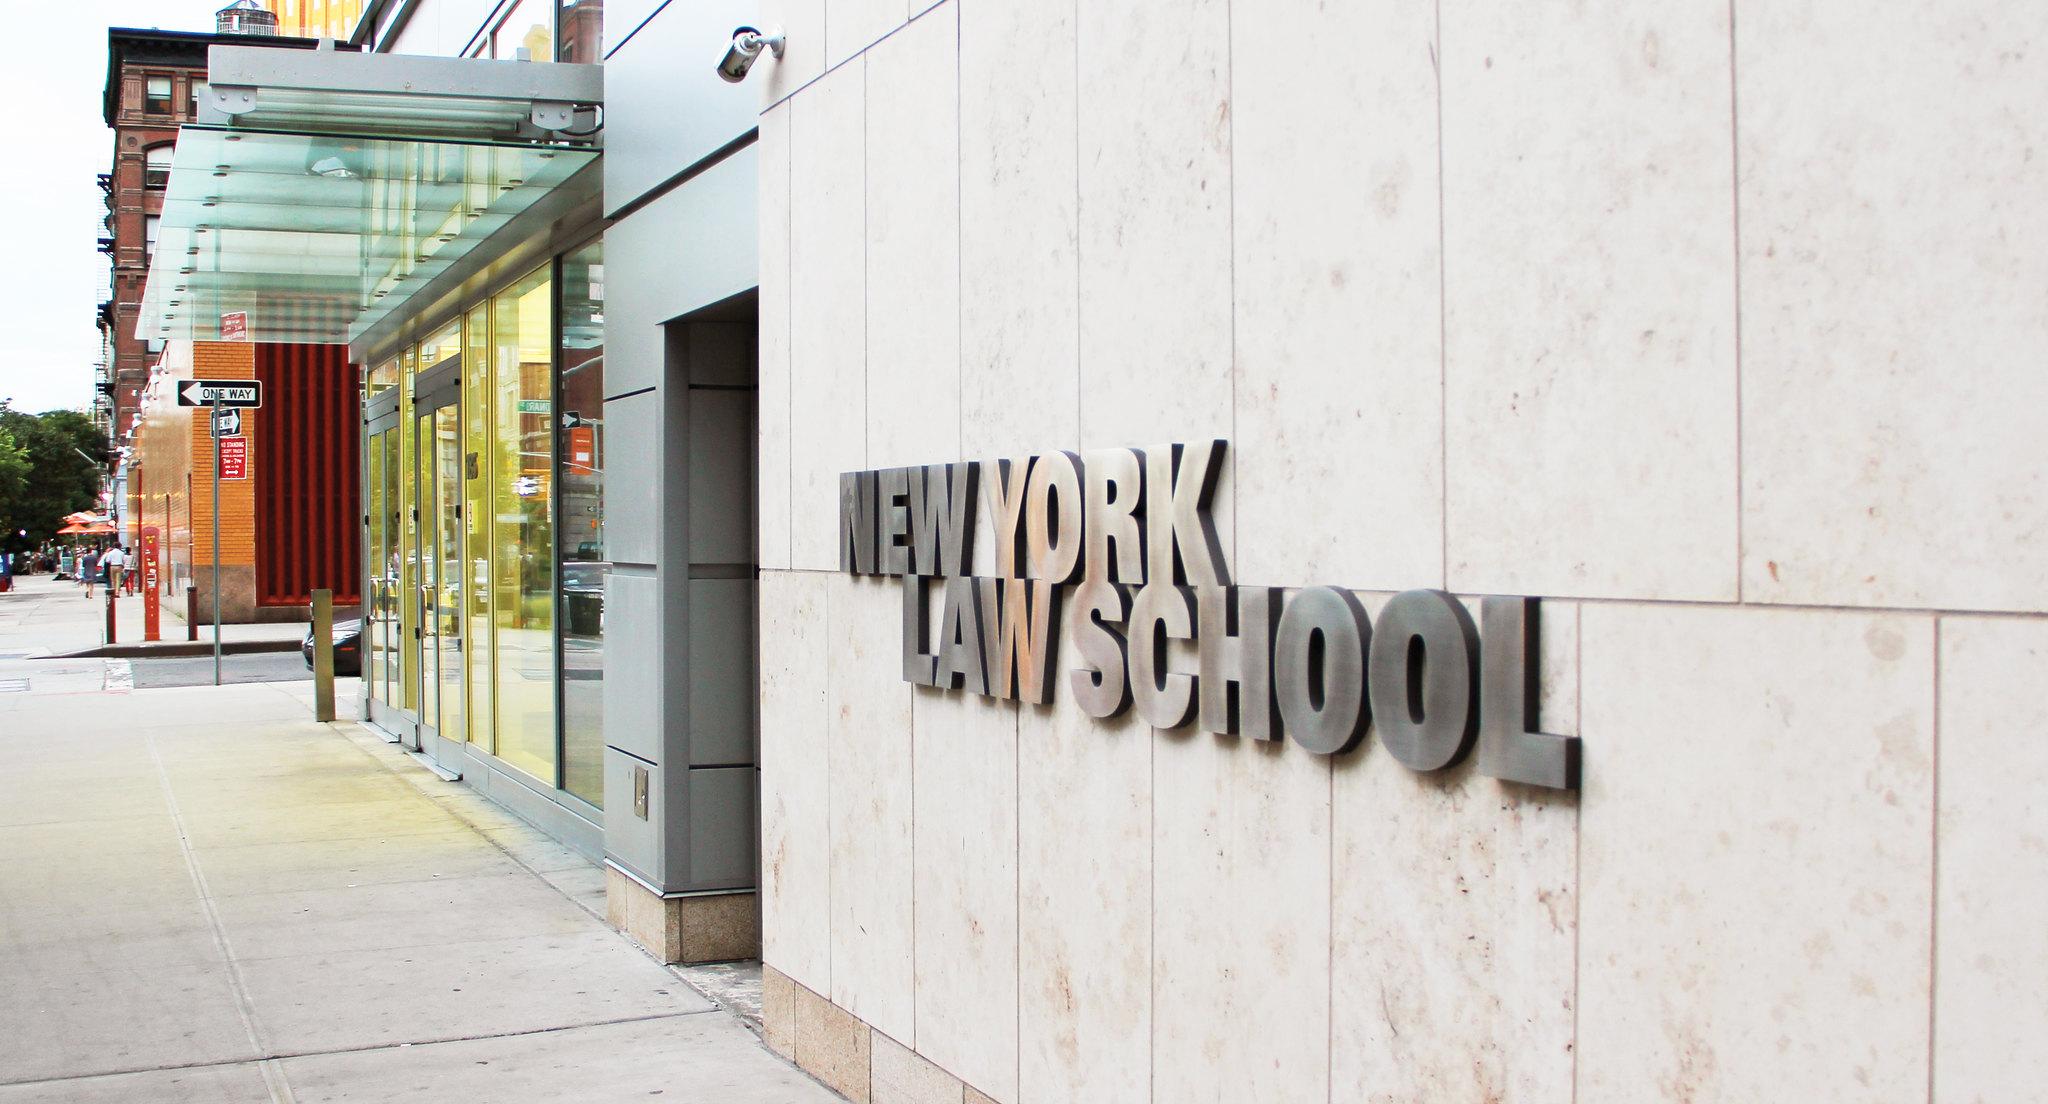 new york law school building